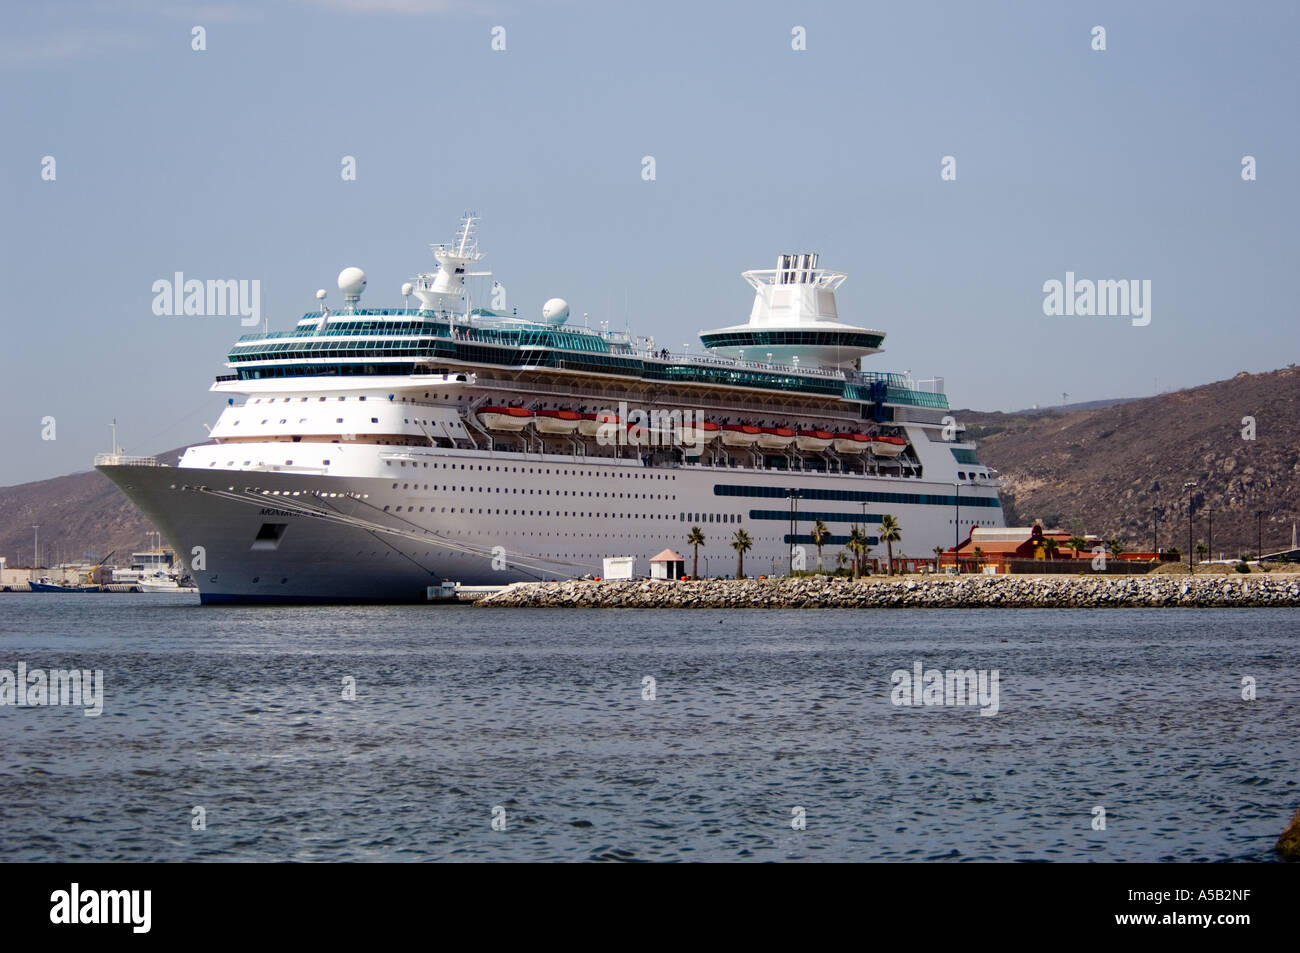 Cruise Ship At Port Ensenada Mexico Stock Photo Royalty Free - Cruise to ensenada